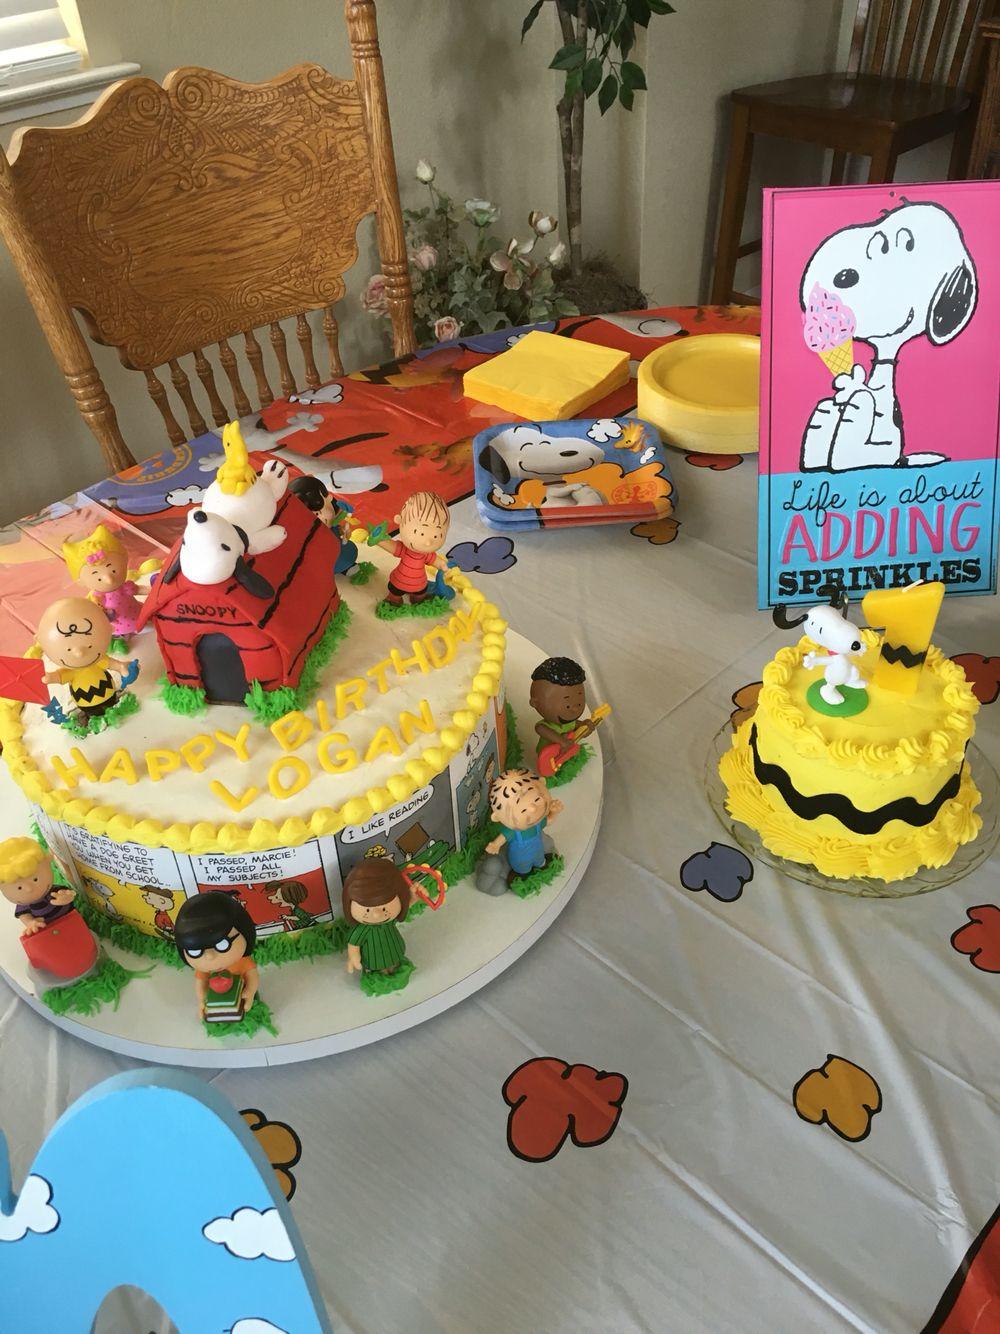 Sensational Charlie Brown Peanuts Birthday Cake For A First Birthday Smash Personalised Birthday Cards Paralily Jamesorg